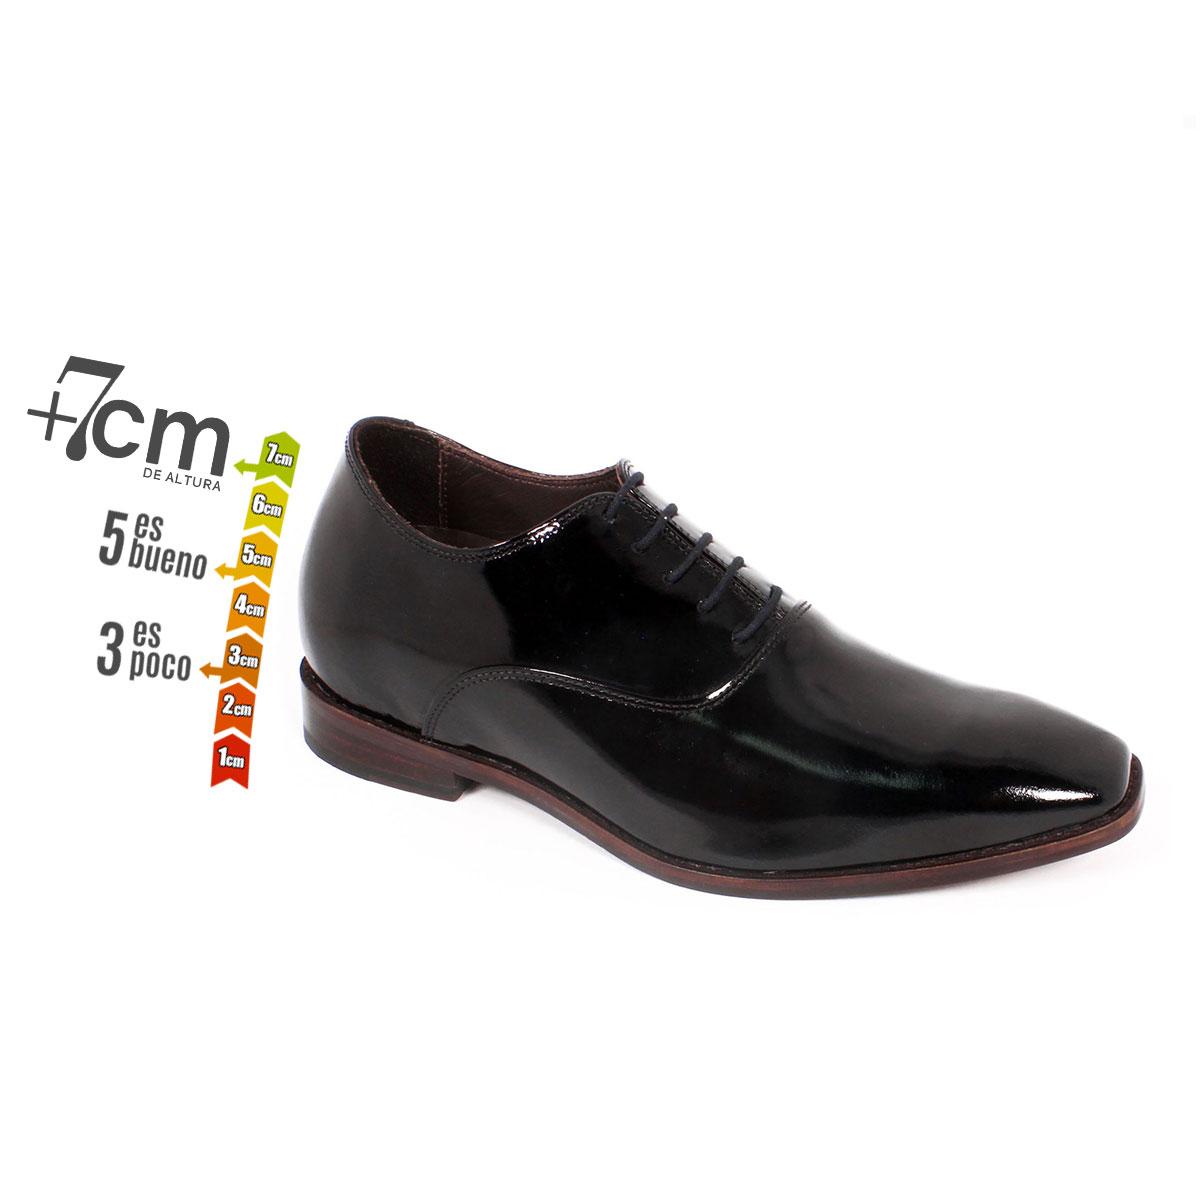 Zapato Formal Elegant Charol Negro Max Denegri +7cm de Altura_74152